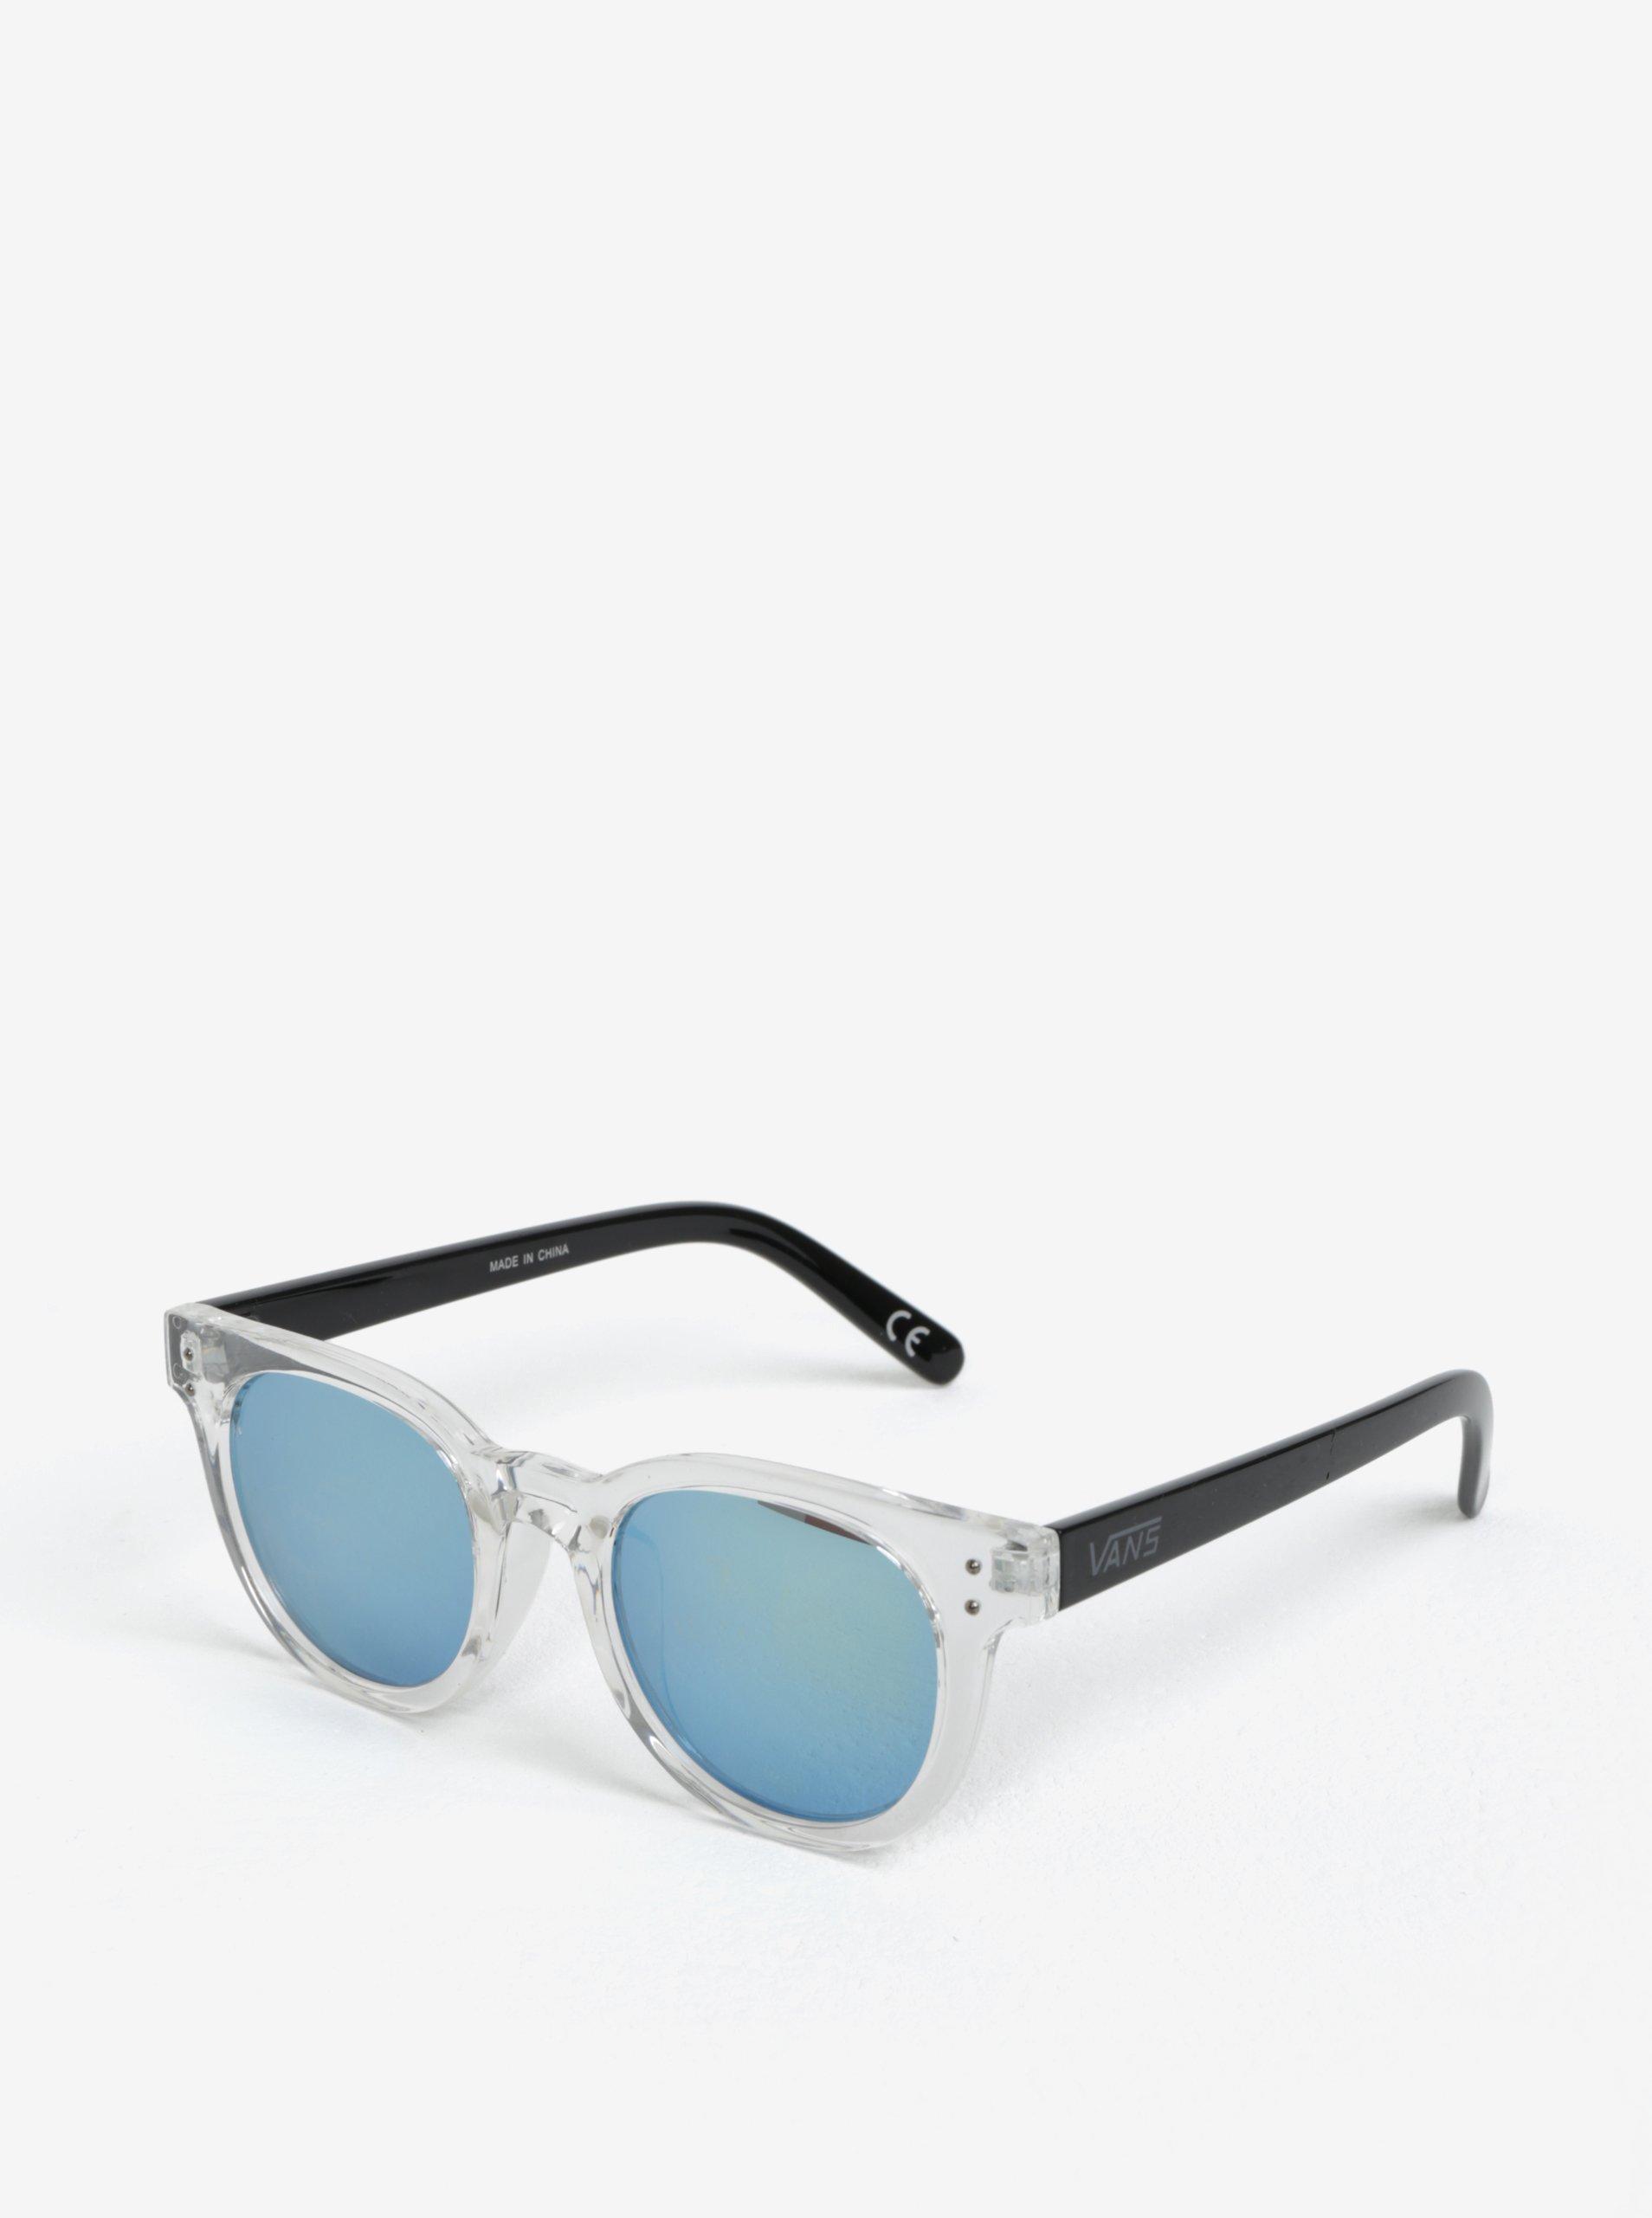 Transparentné pánske slnečné okuliare VANS Welborn  059a1da3d98